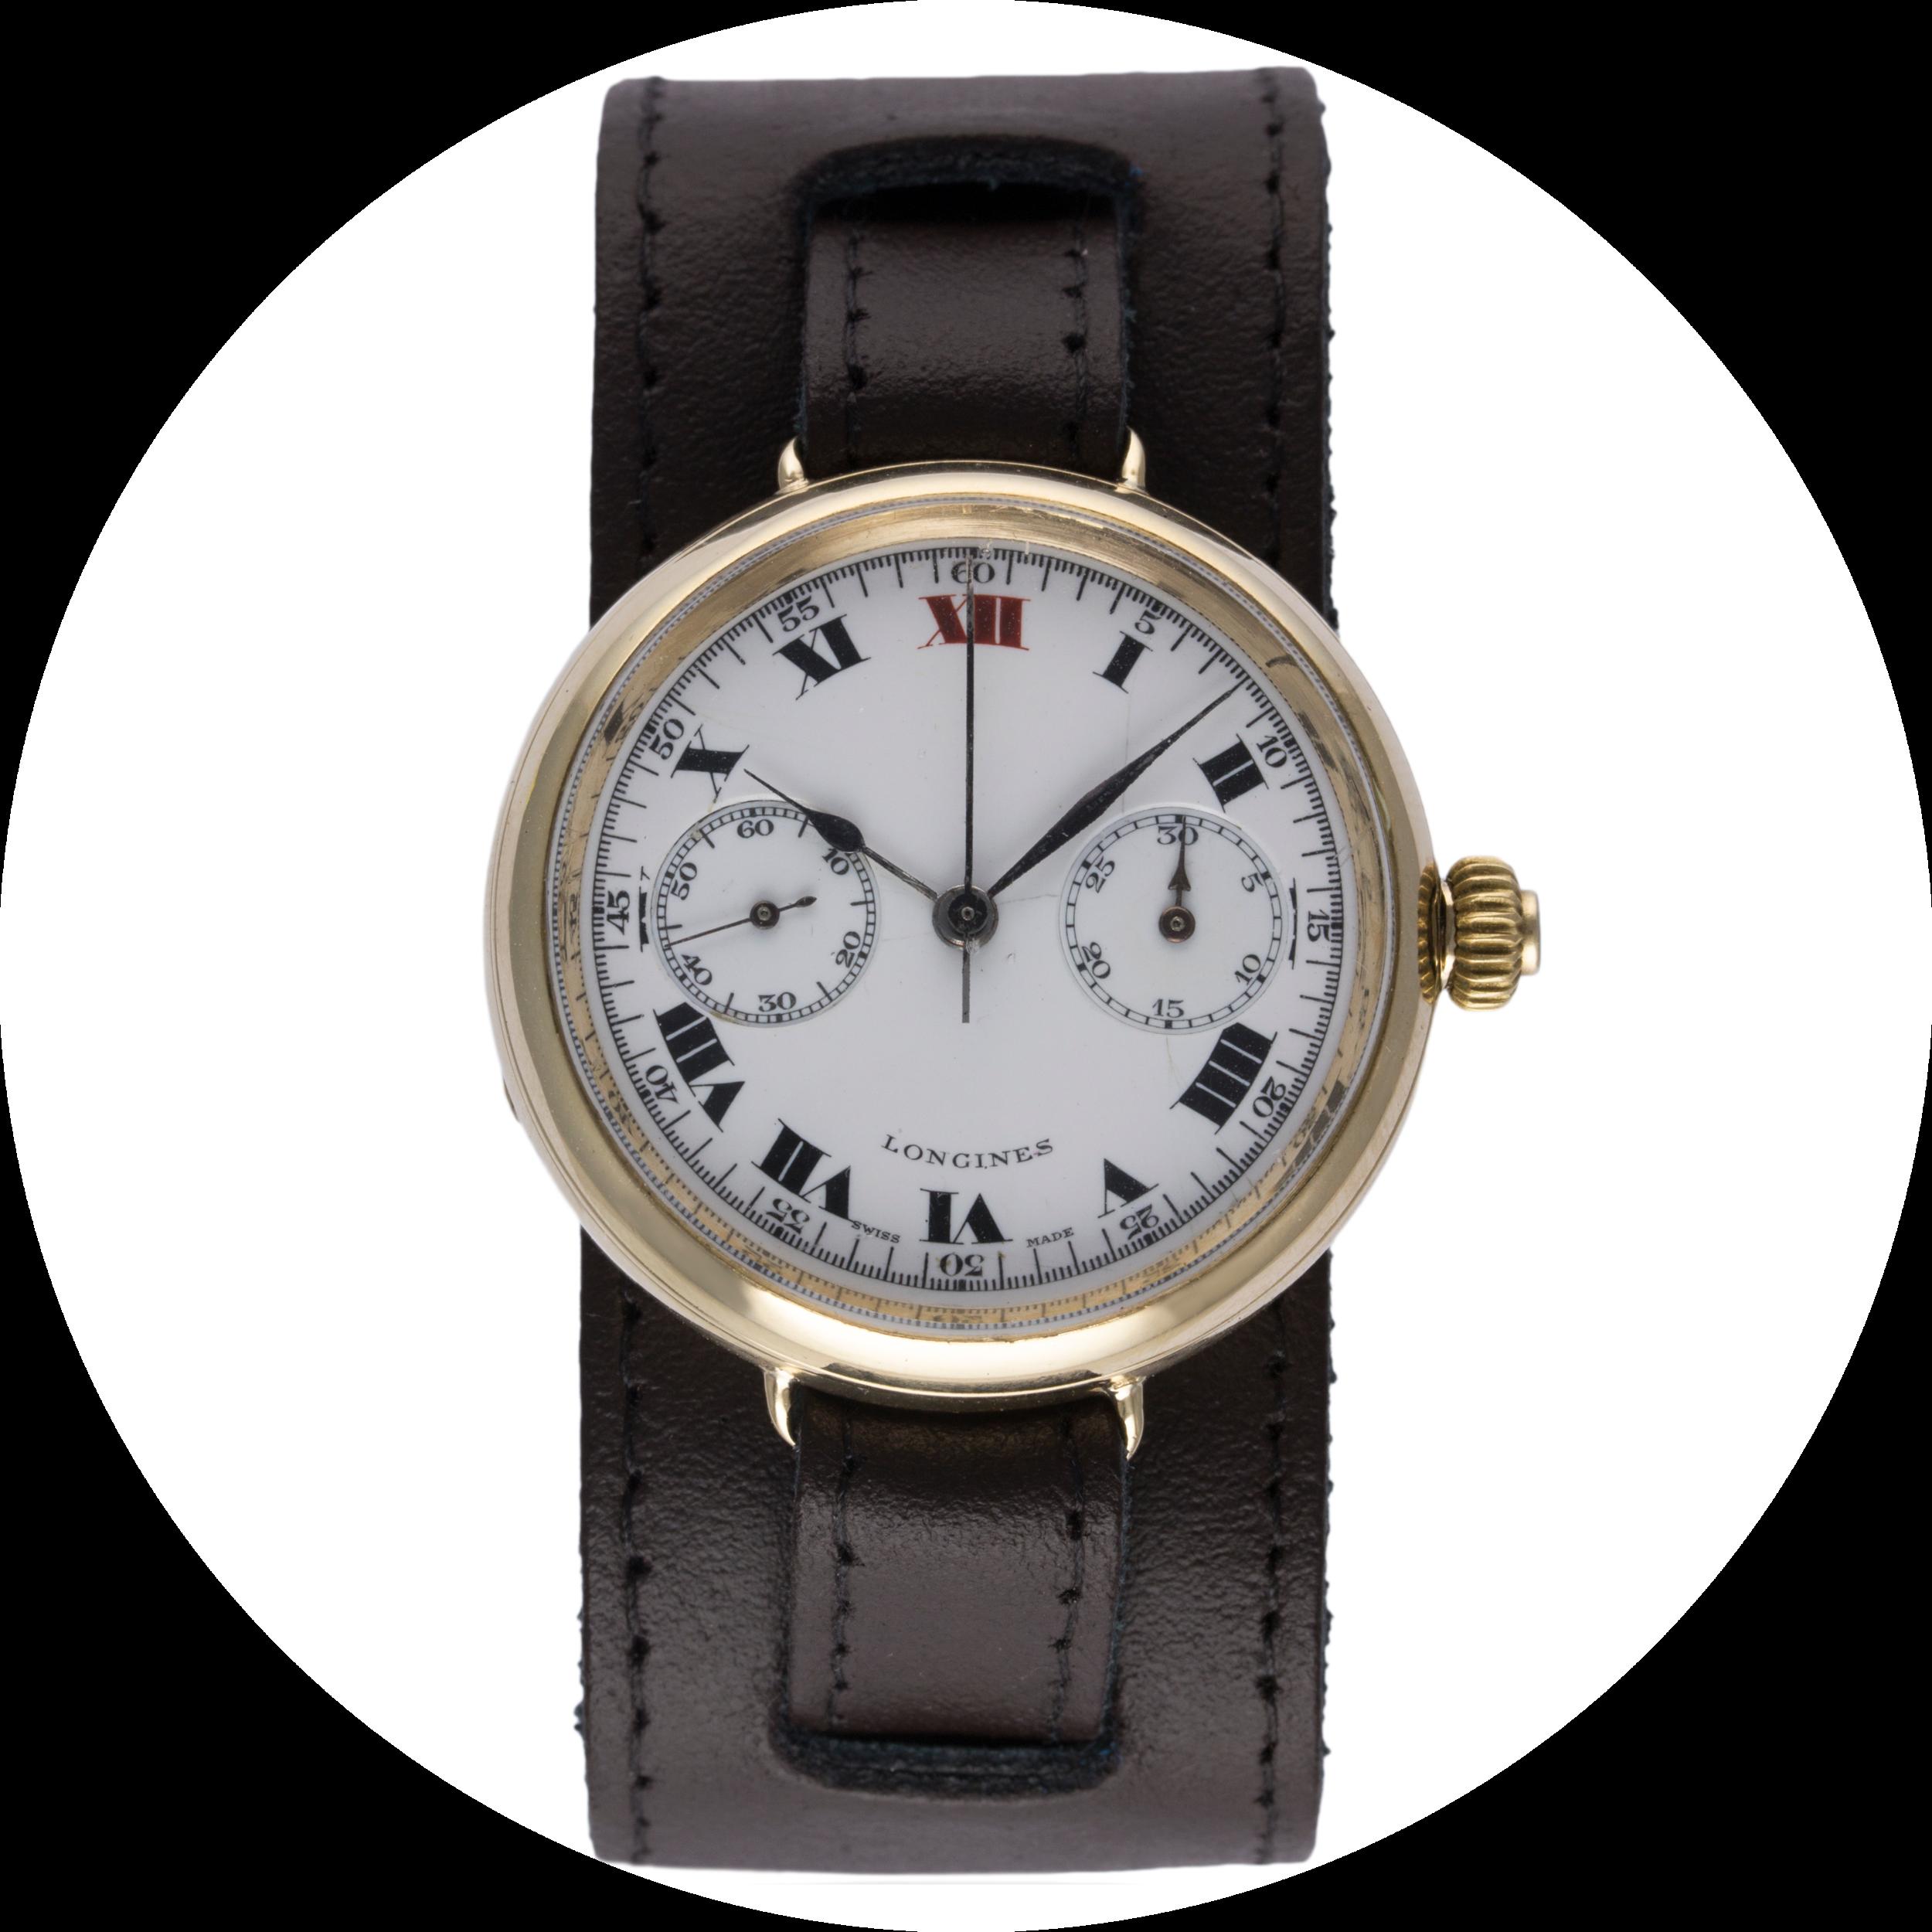 Lot 189 - Longines Monopusher Chronograph